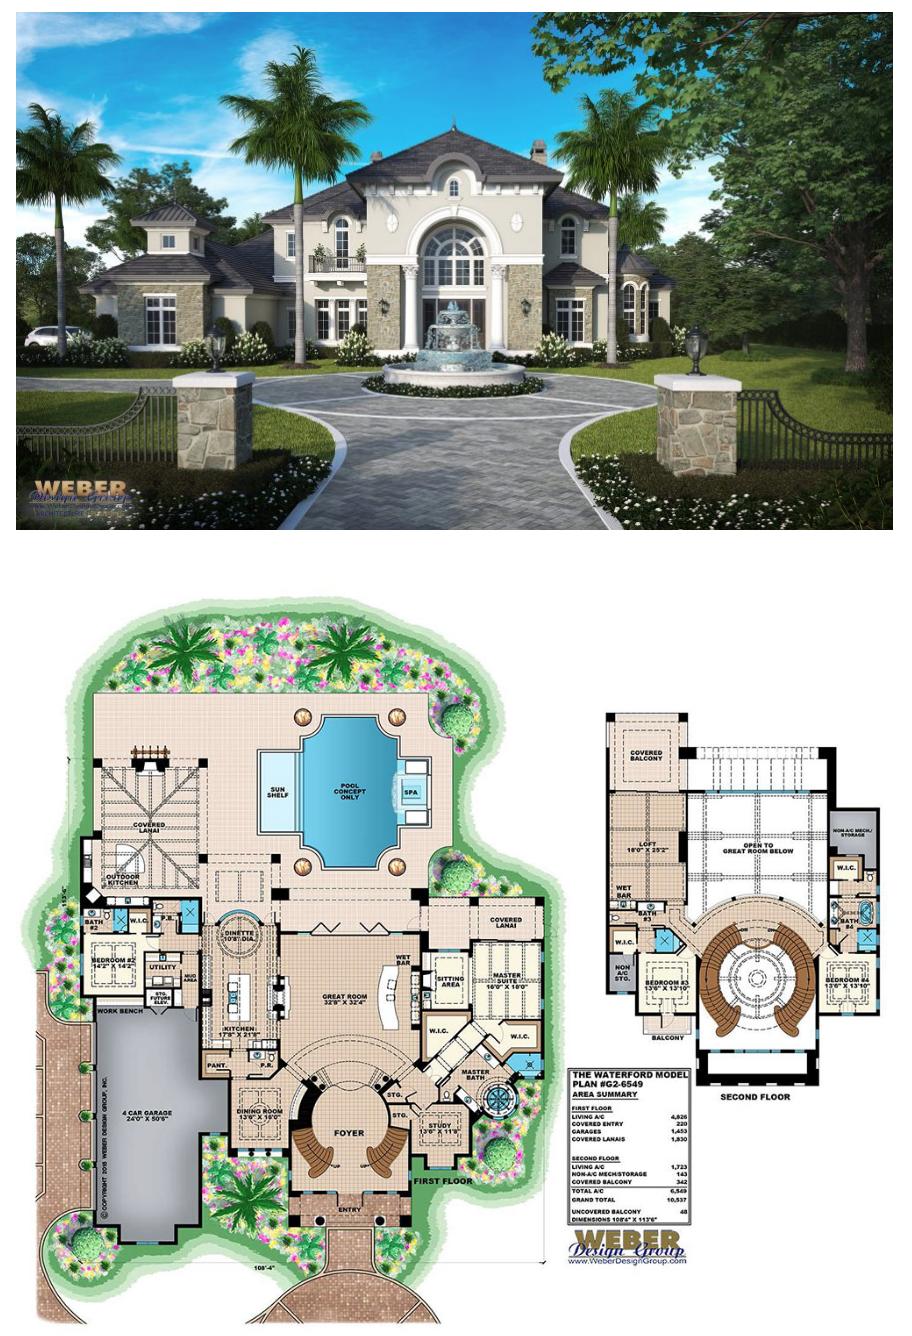 Waterford House Plan Weber Design Group Naples Fl House Plans Mansion Dream House Plans Home Design Floor Plans